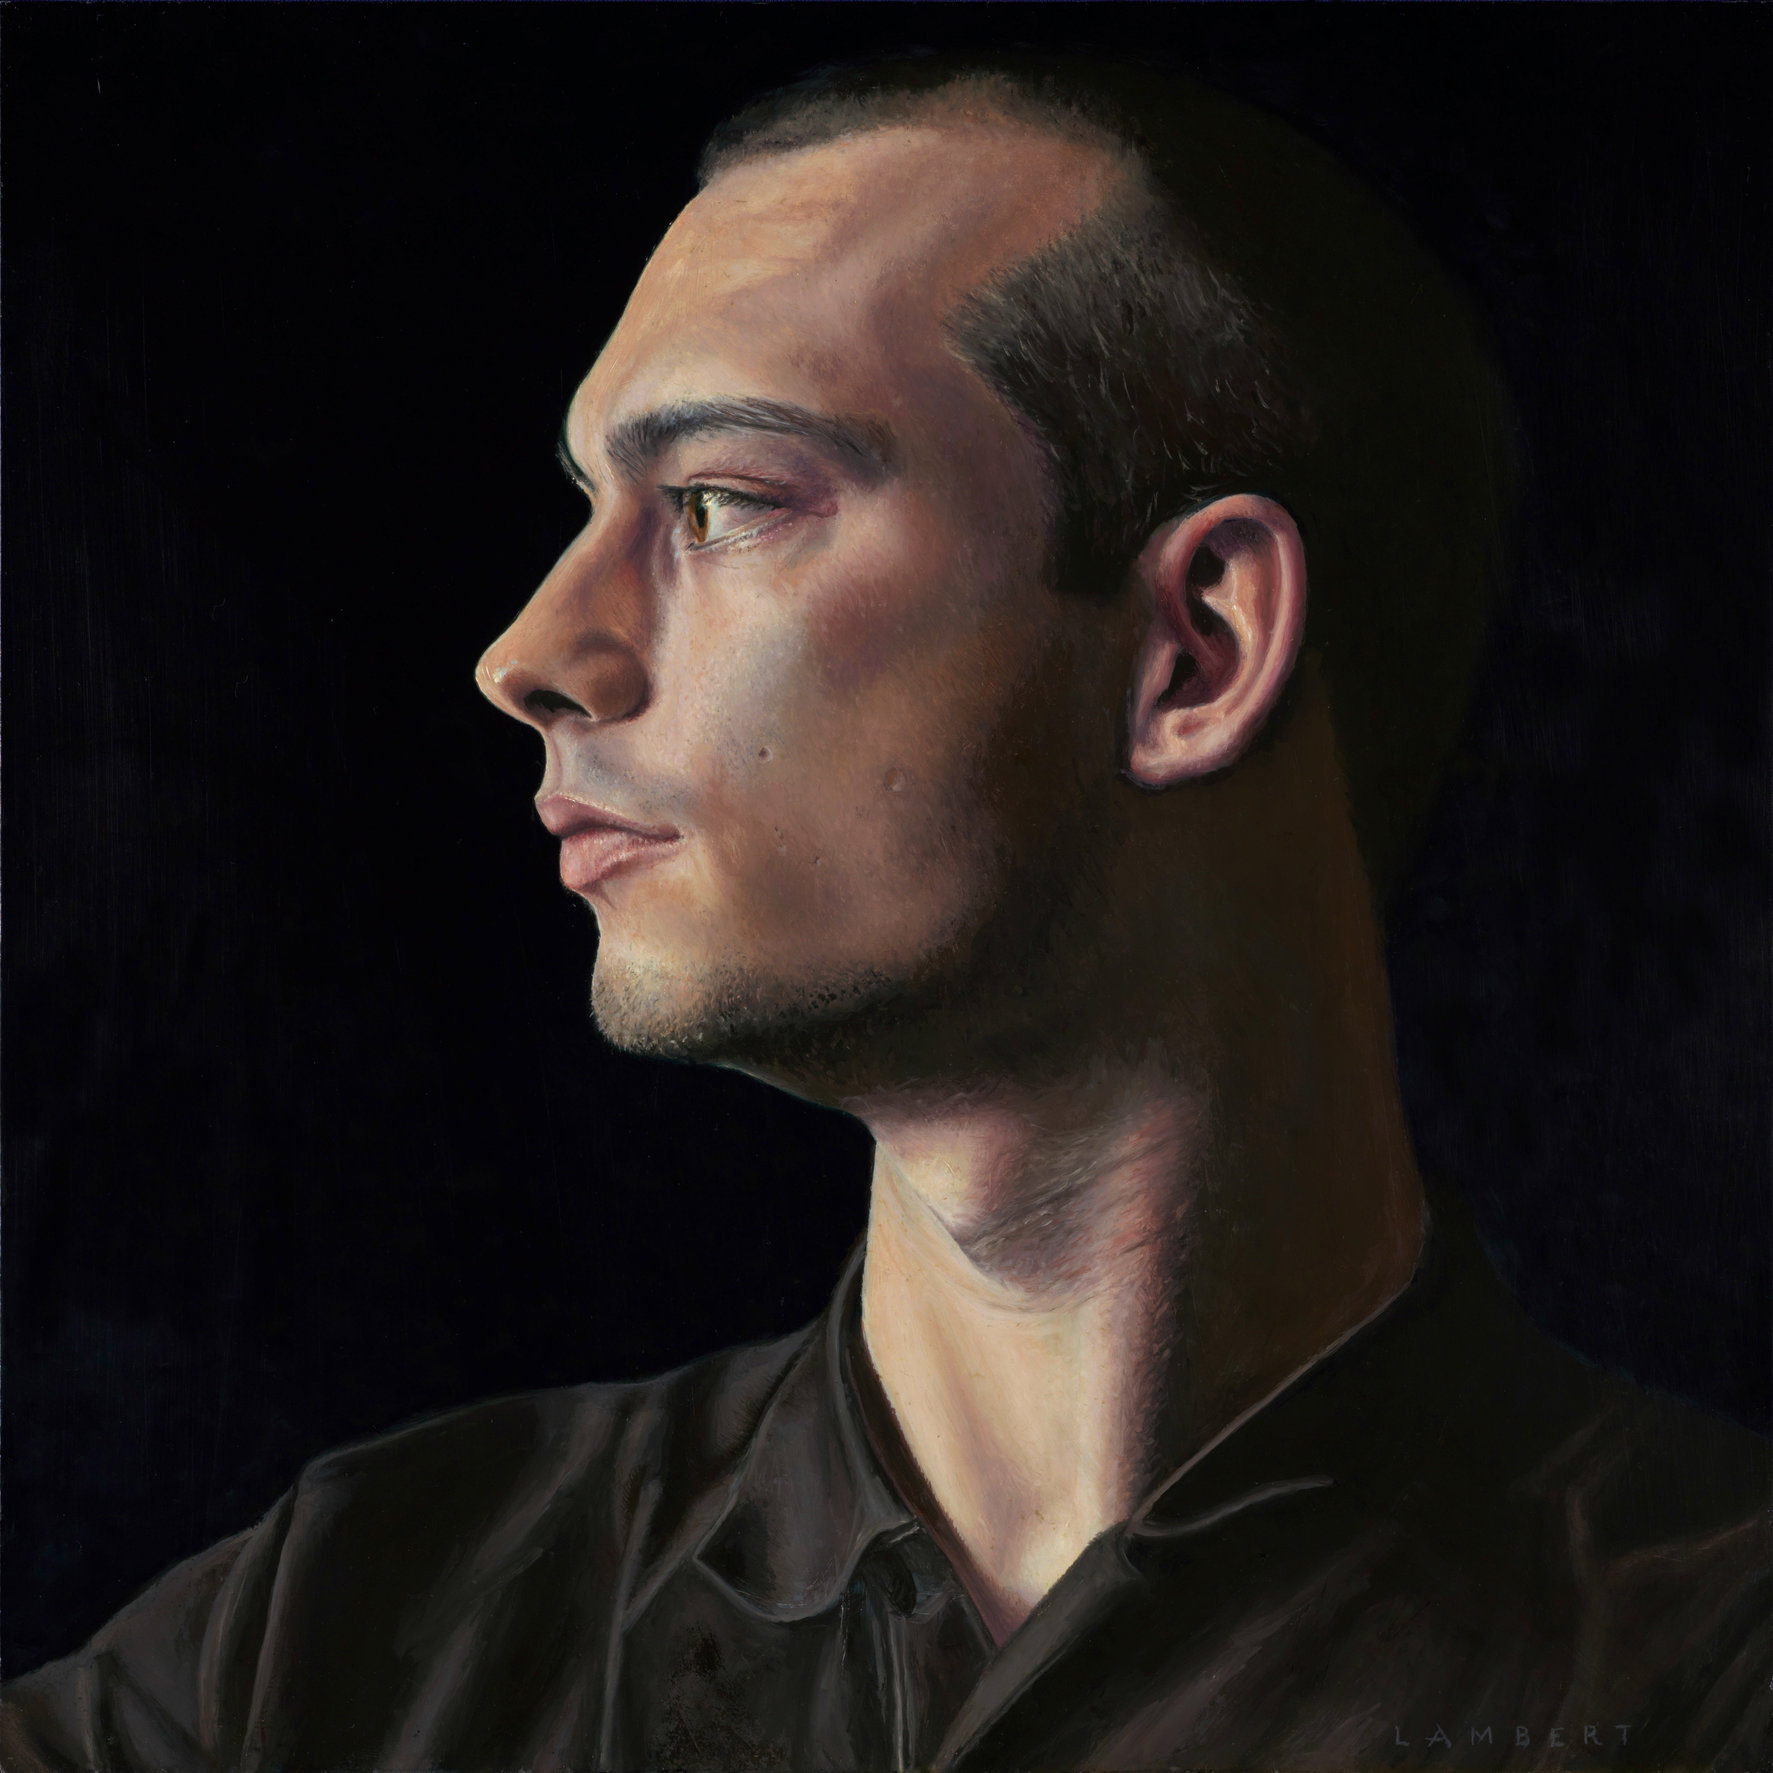 Remco 'en profile', 2014